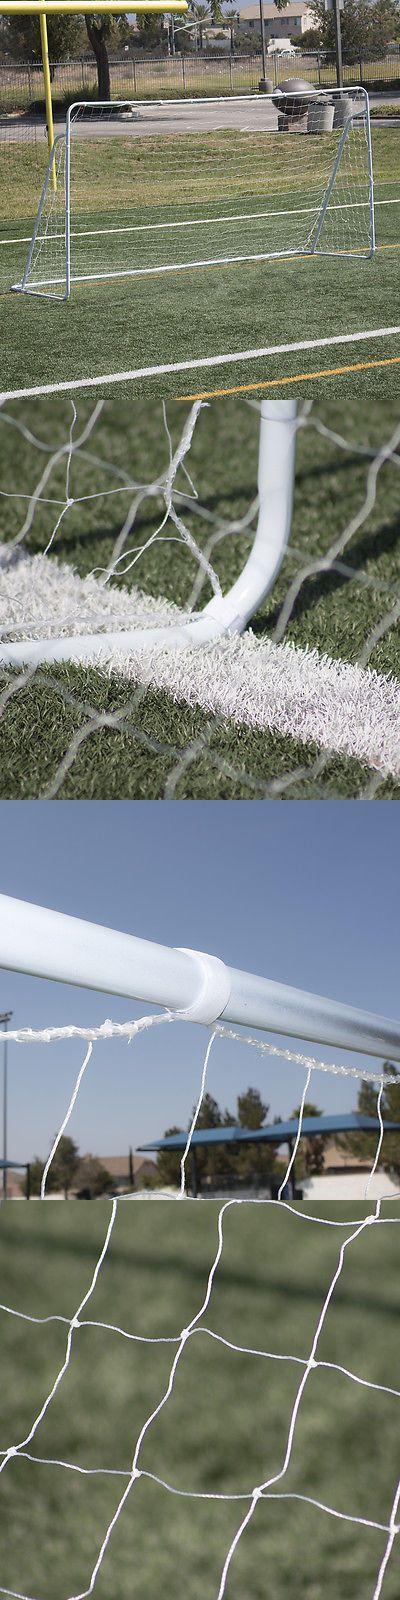 Other Soccer 2914: New 12 X 6 Ft Full Size Football Net For Soccer Goal Post Junior Sports Training BUY IT NOW ONLY: $54.97